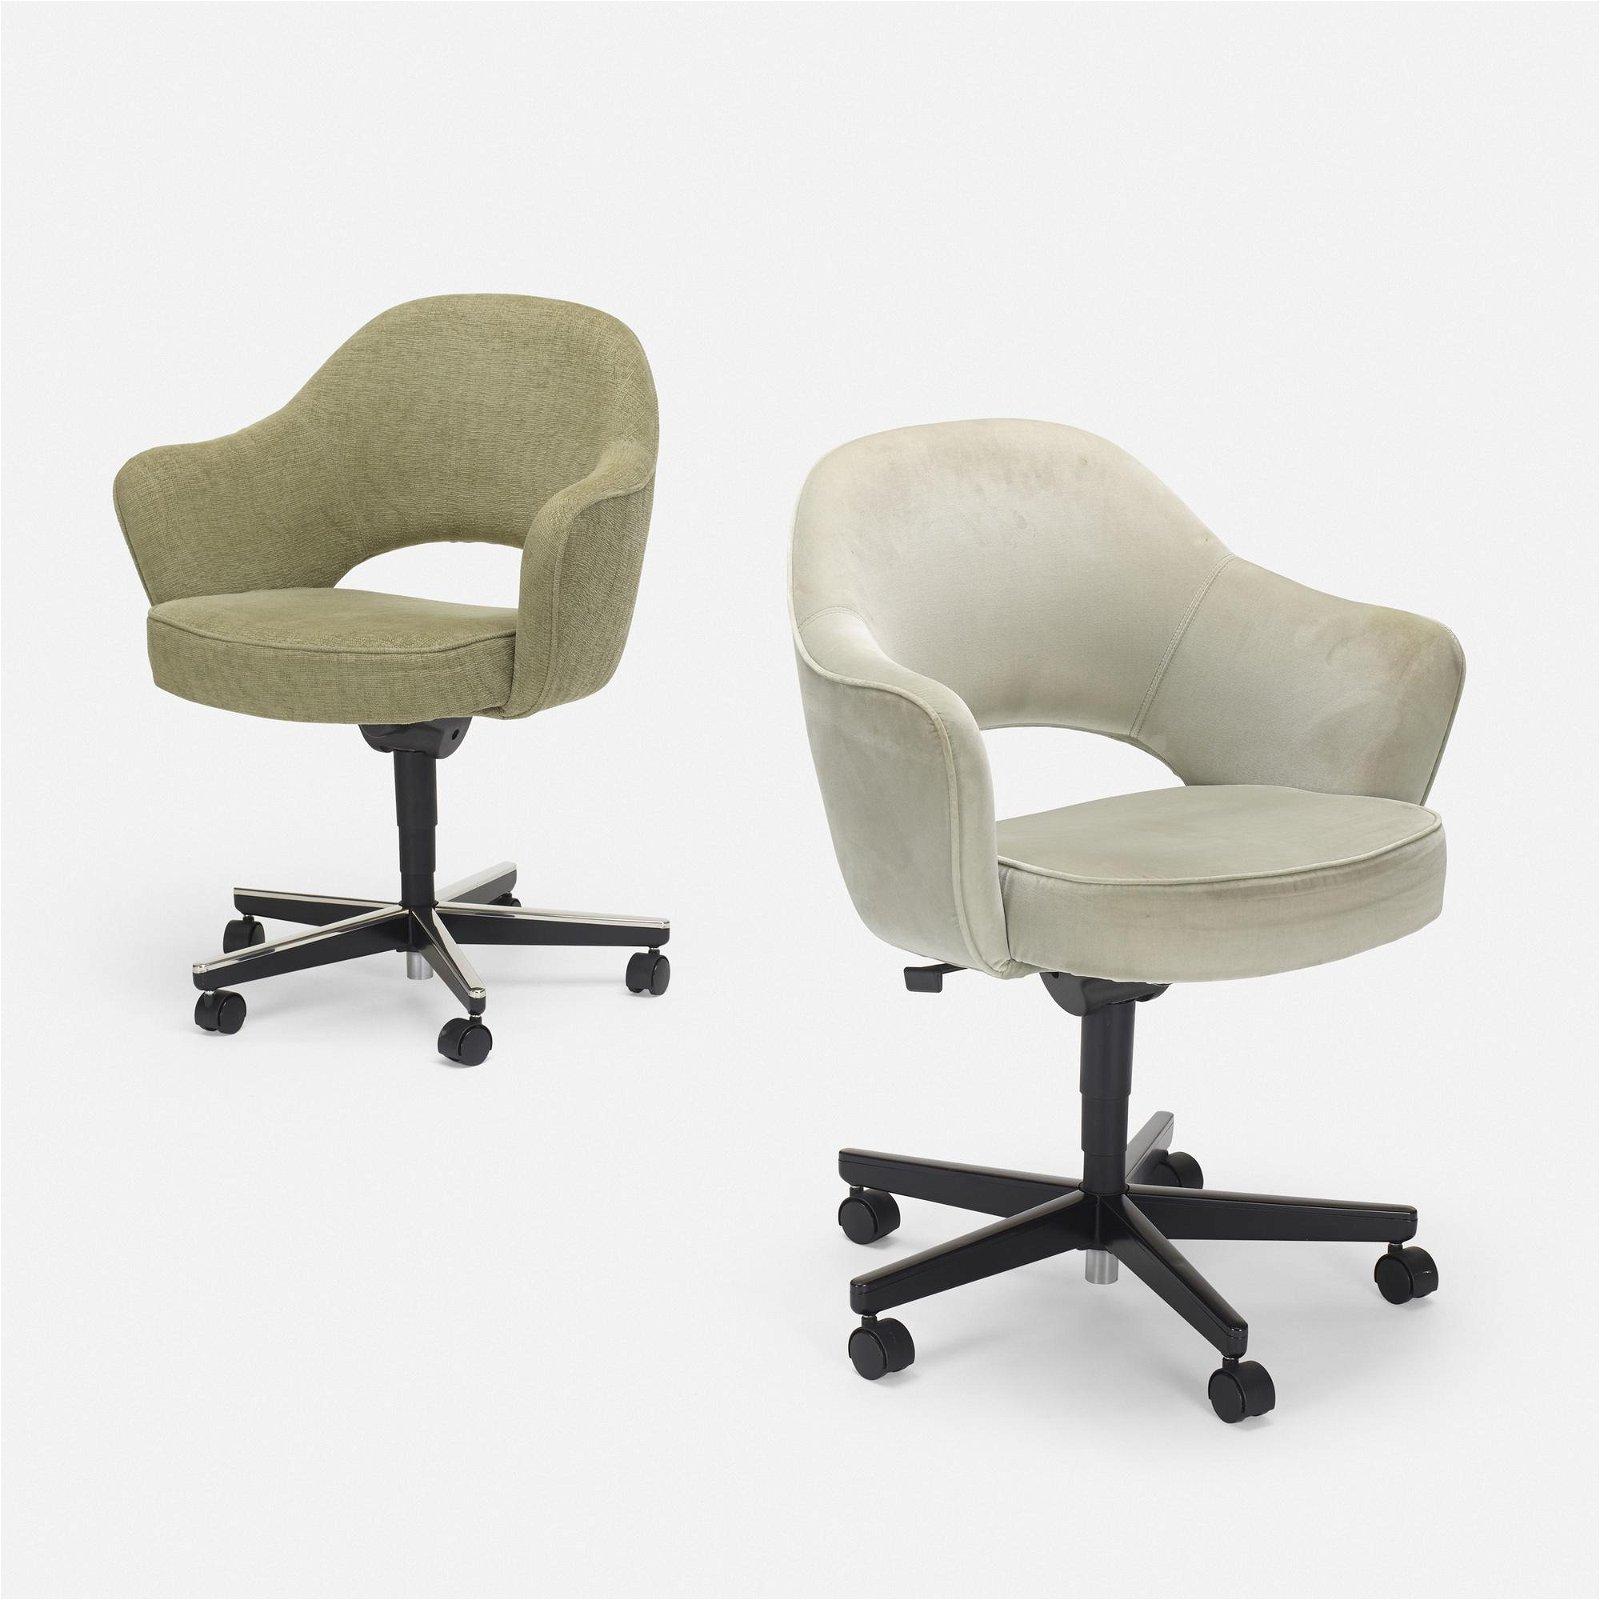 Eero Saarinen, Executive armchairs, pair